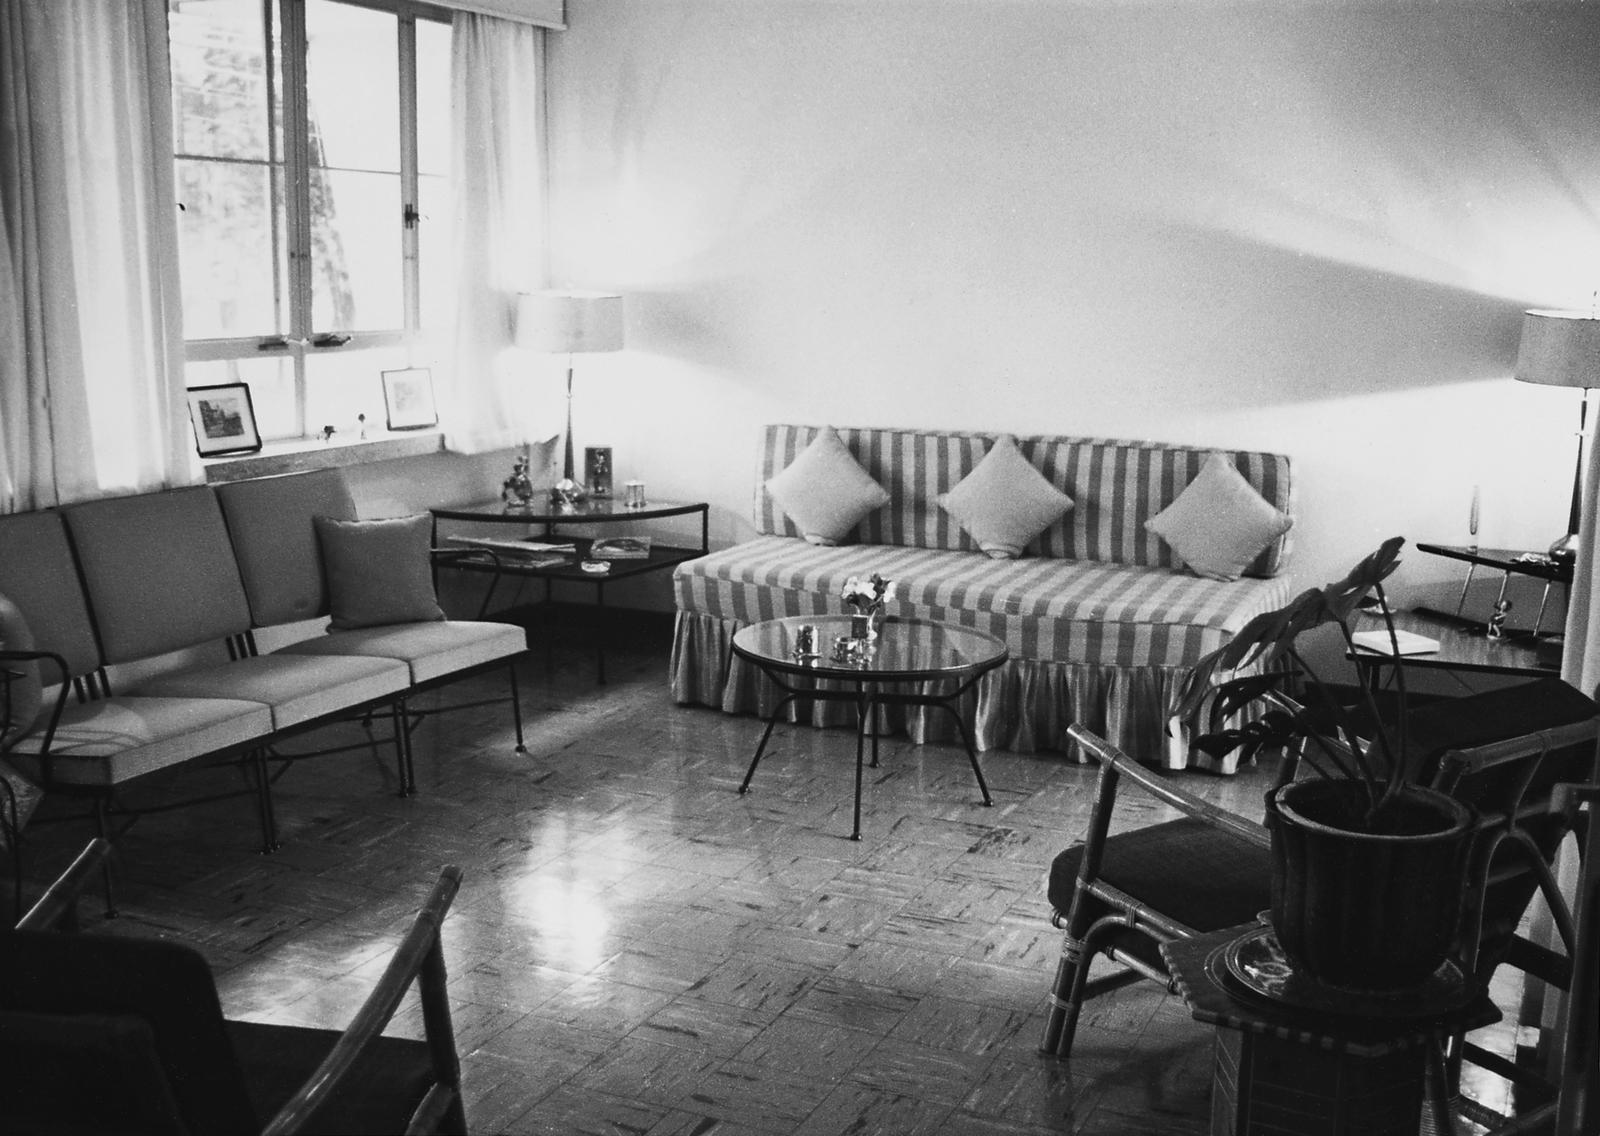 Bangkok - Multi-Unit Residential Building - 1964